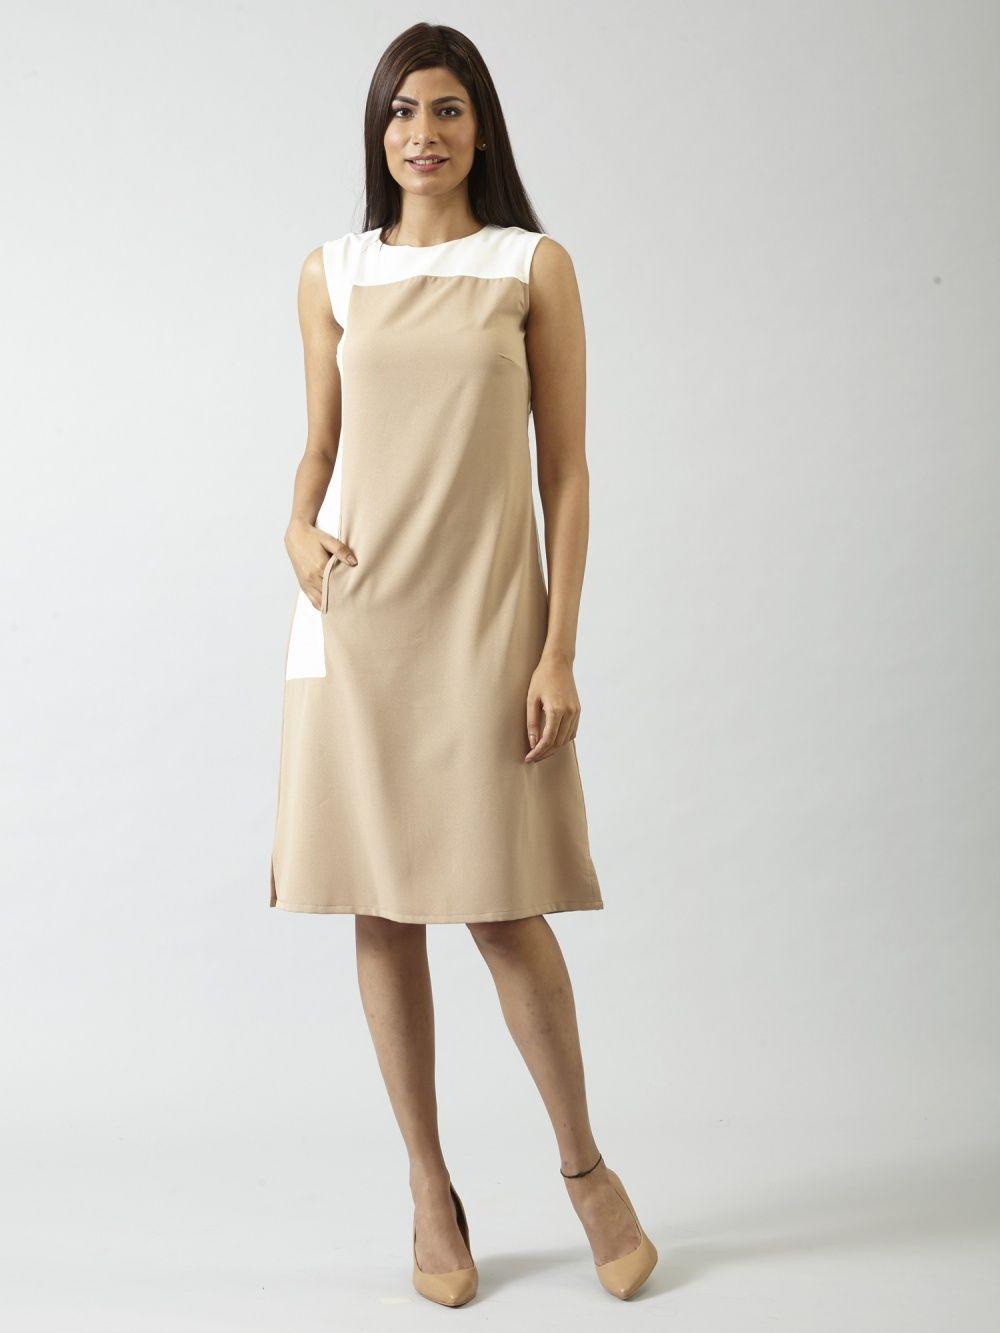 e20c14c566 FableStreet Dresses   Buy FableStreet Colour Block Shift Dress ...